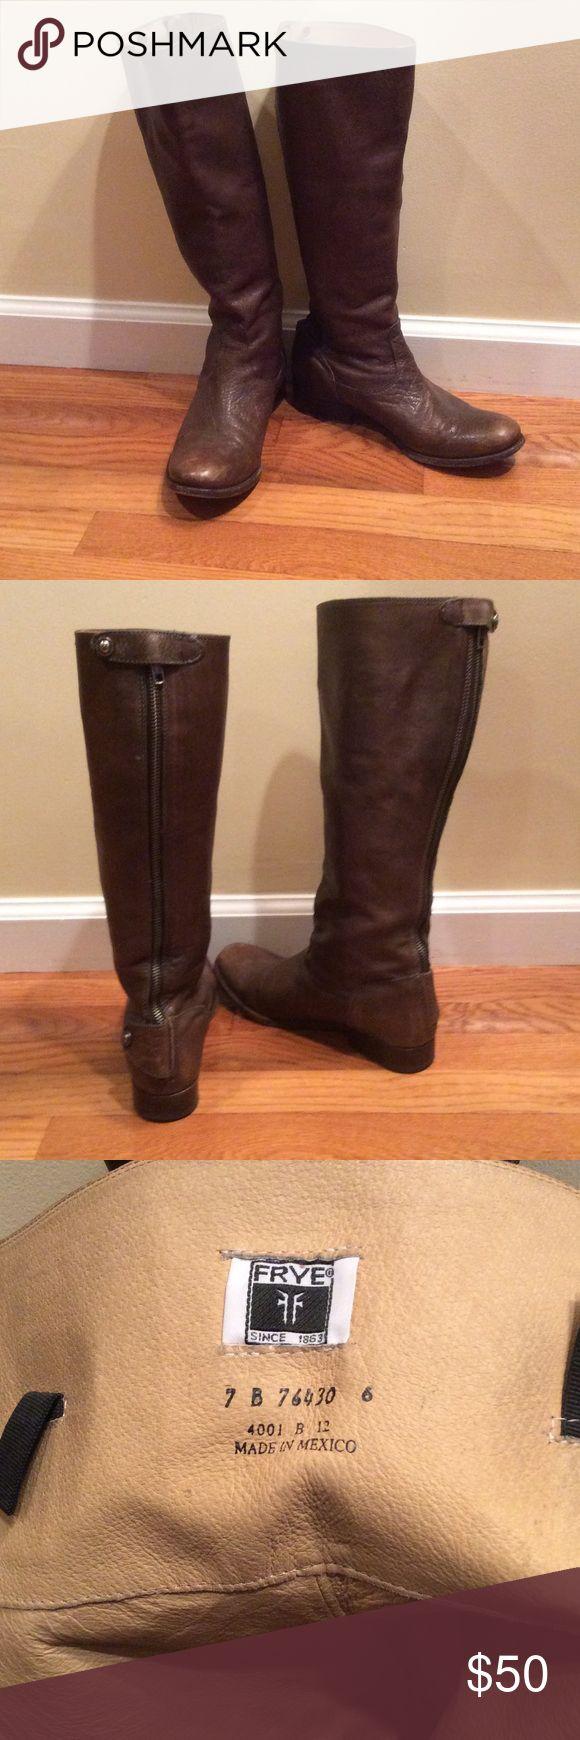 "Women's Frye Boots Frye Melissa Button Back Zipper Boot Shaft 15.5 "", Circumference 151/2, Heel 1"" Antique Brownish Frye Shoes Heeled Boots"